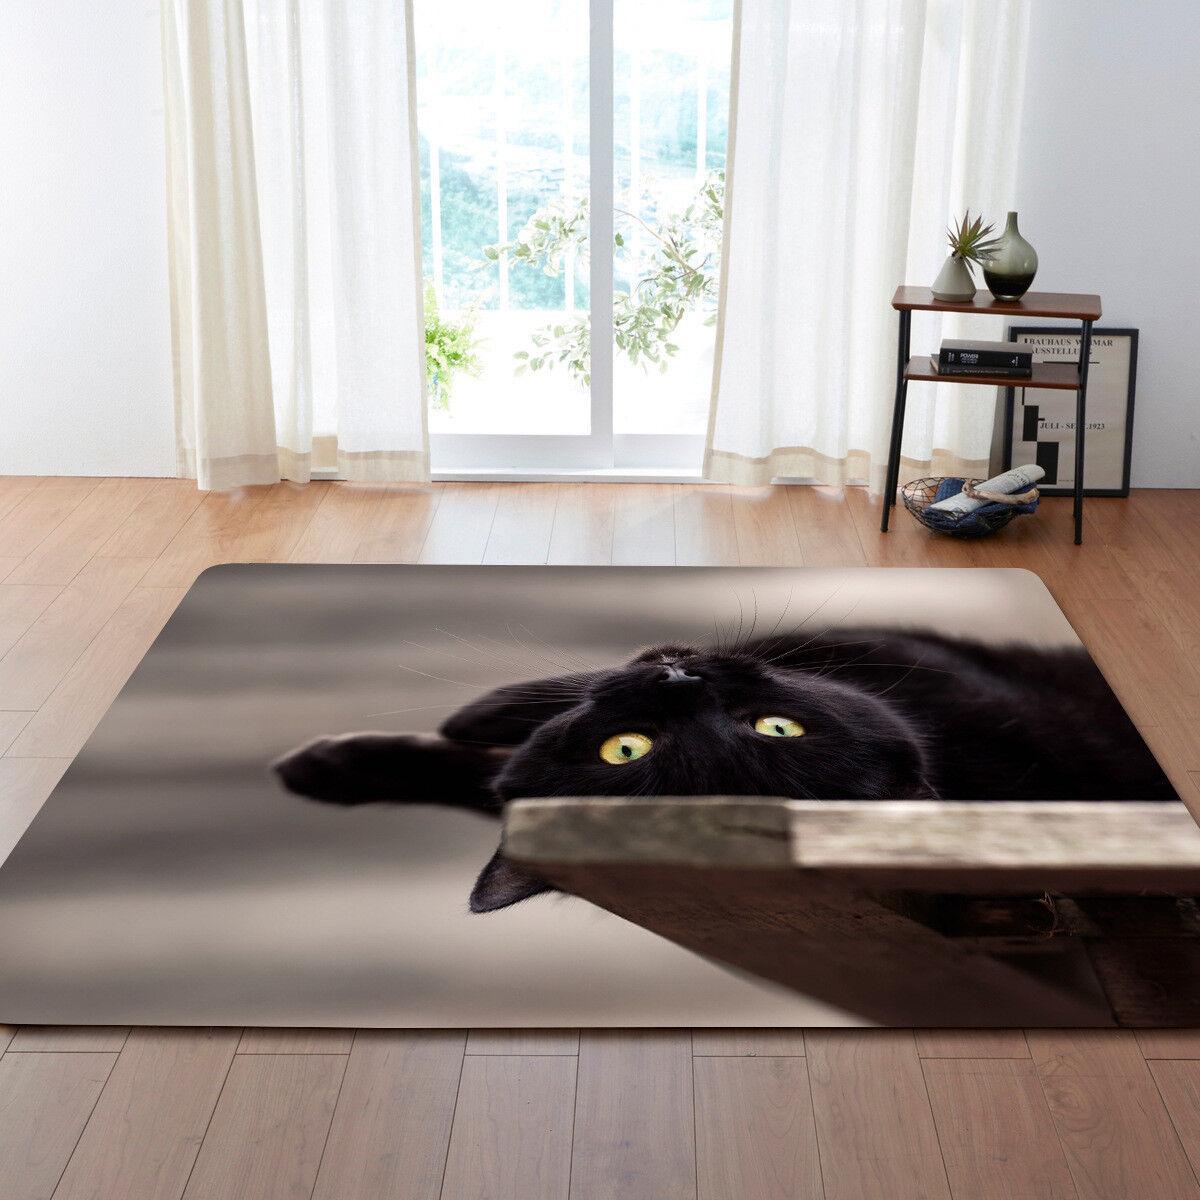 Nera Gatti Fantasia 3D Tappeto Moderno Carpet. Antiscivolo